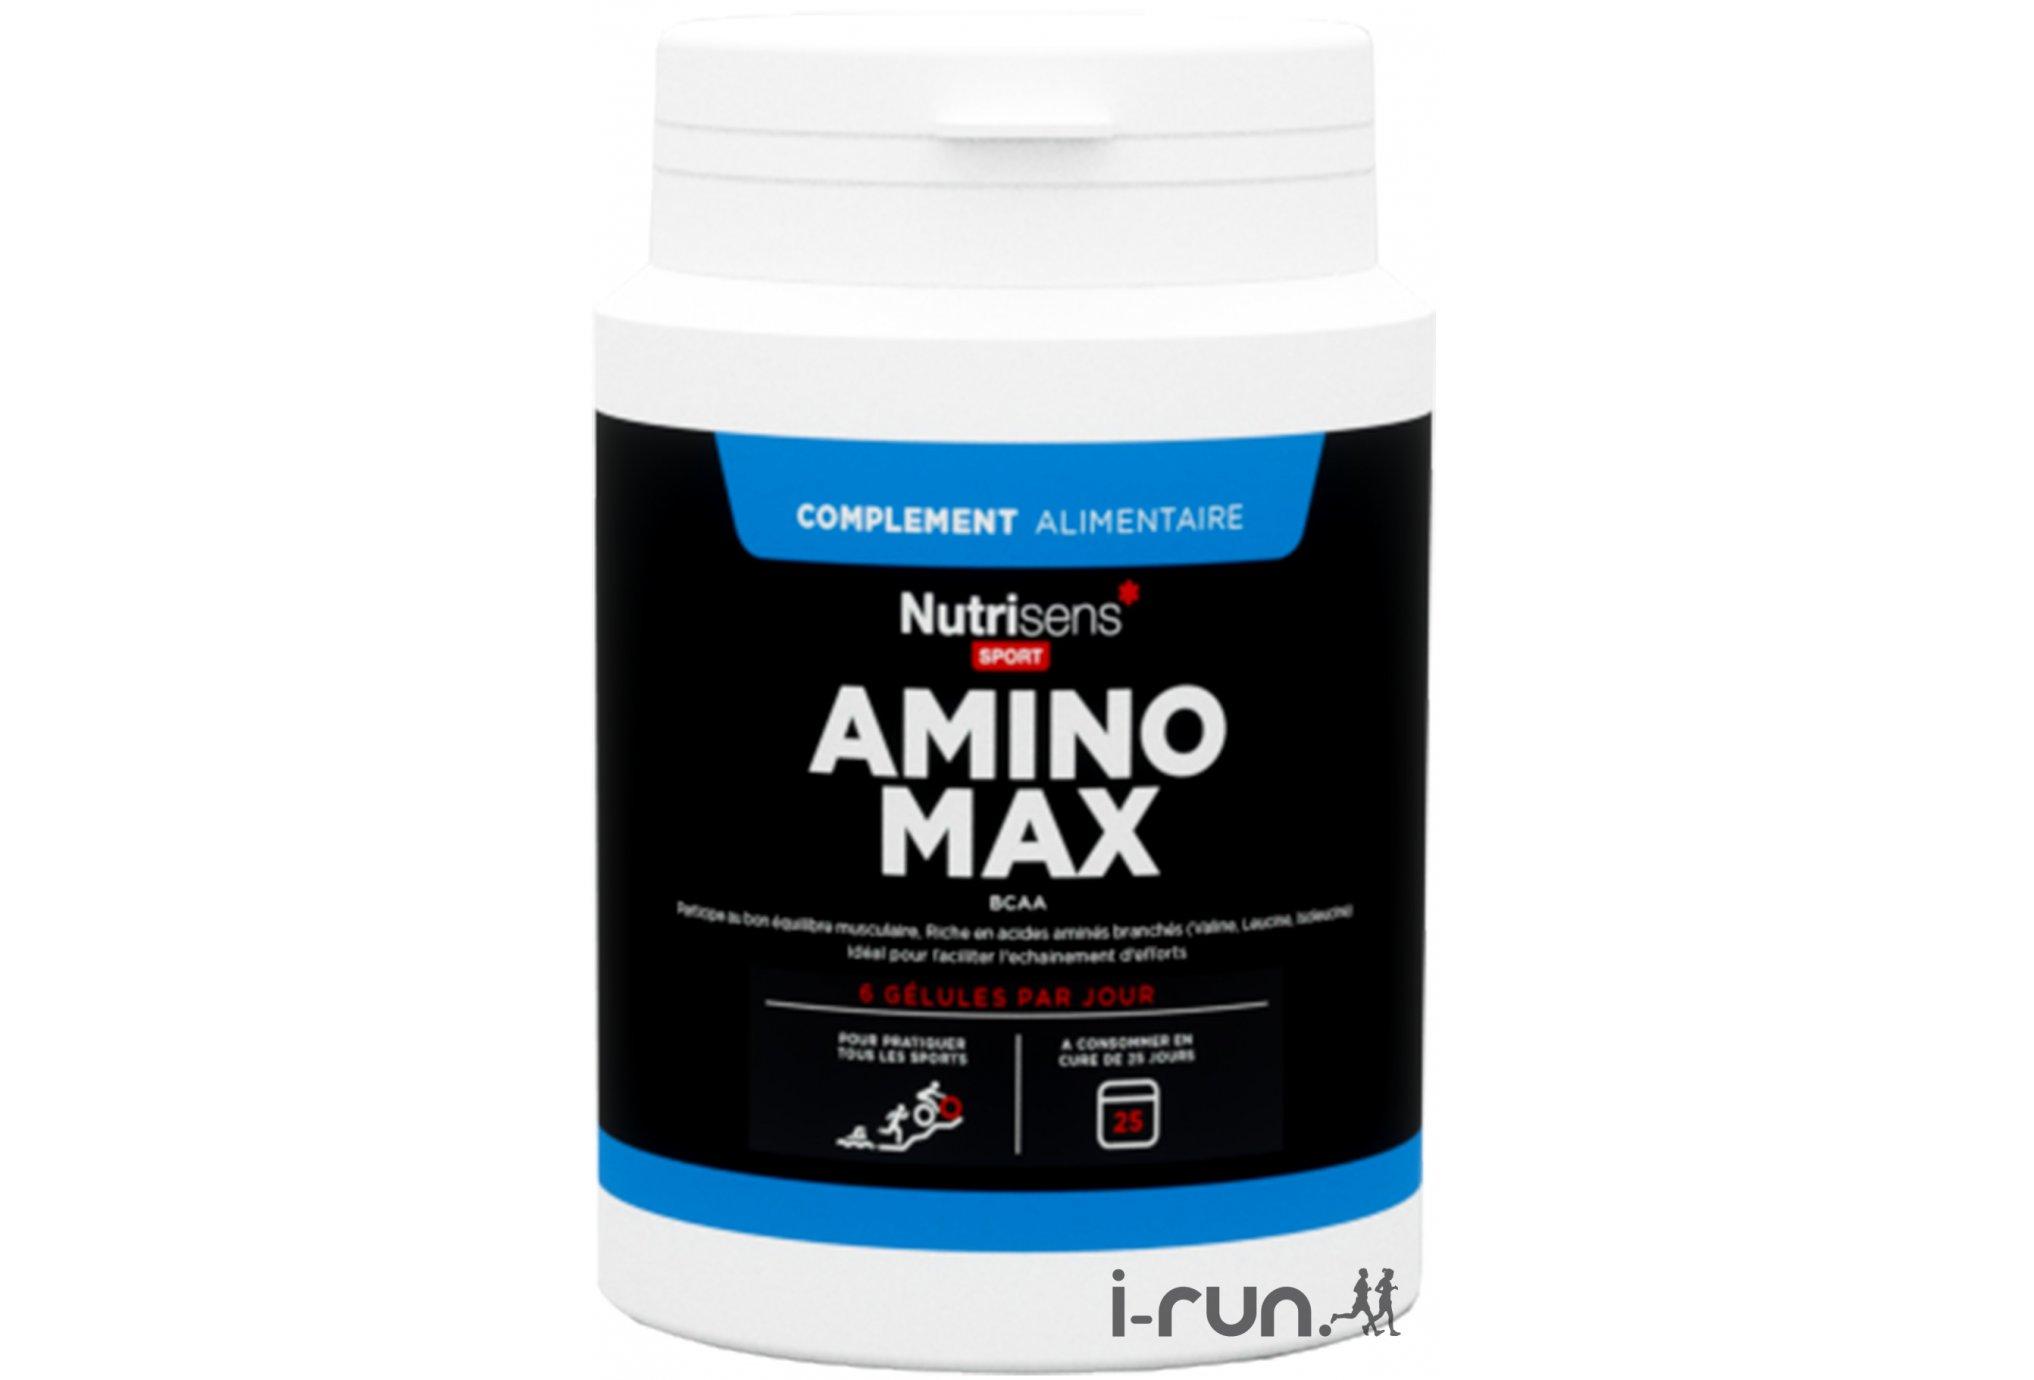 Nutrisens Sport Amino Max Diététique Compléments